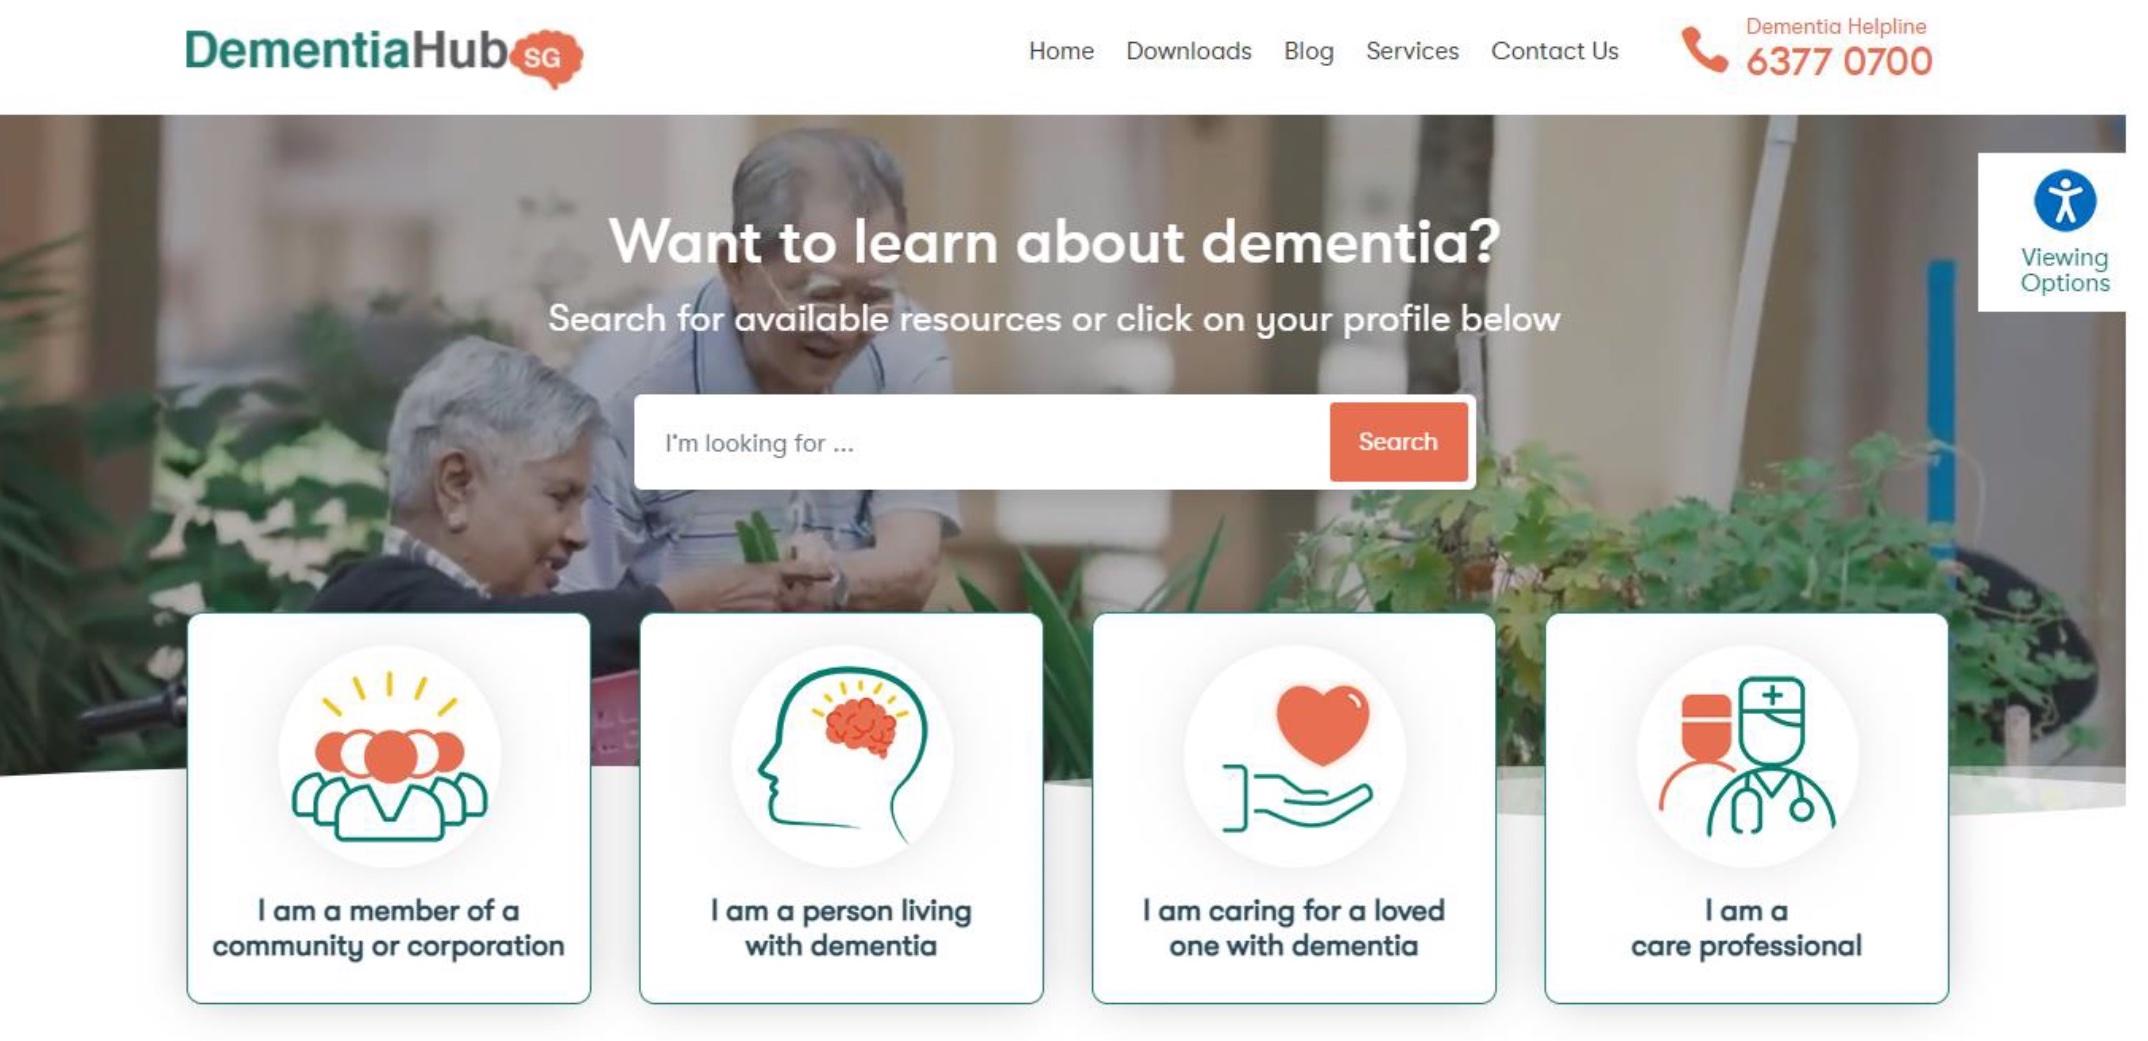 One-stop resource portal on dementia